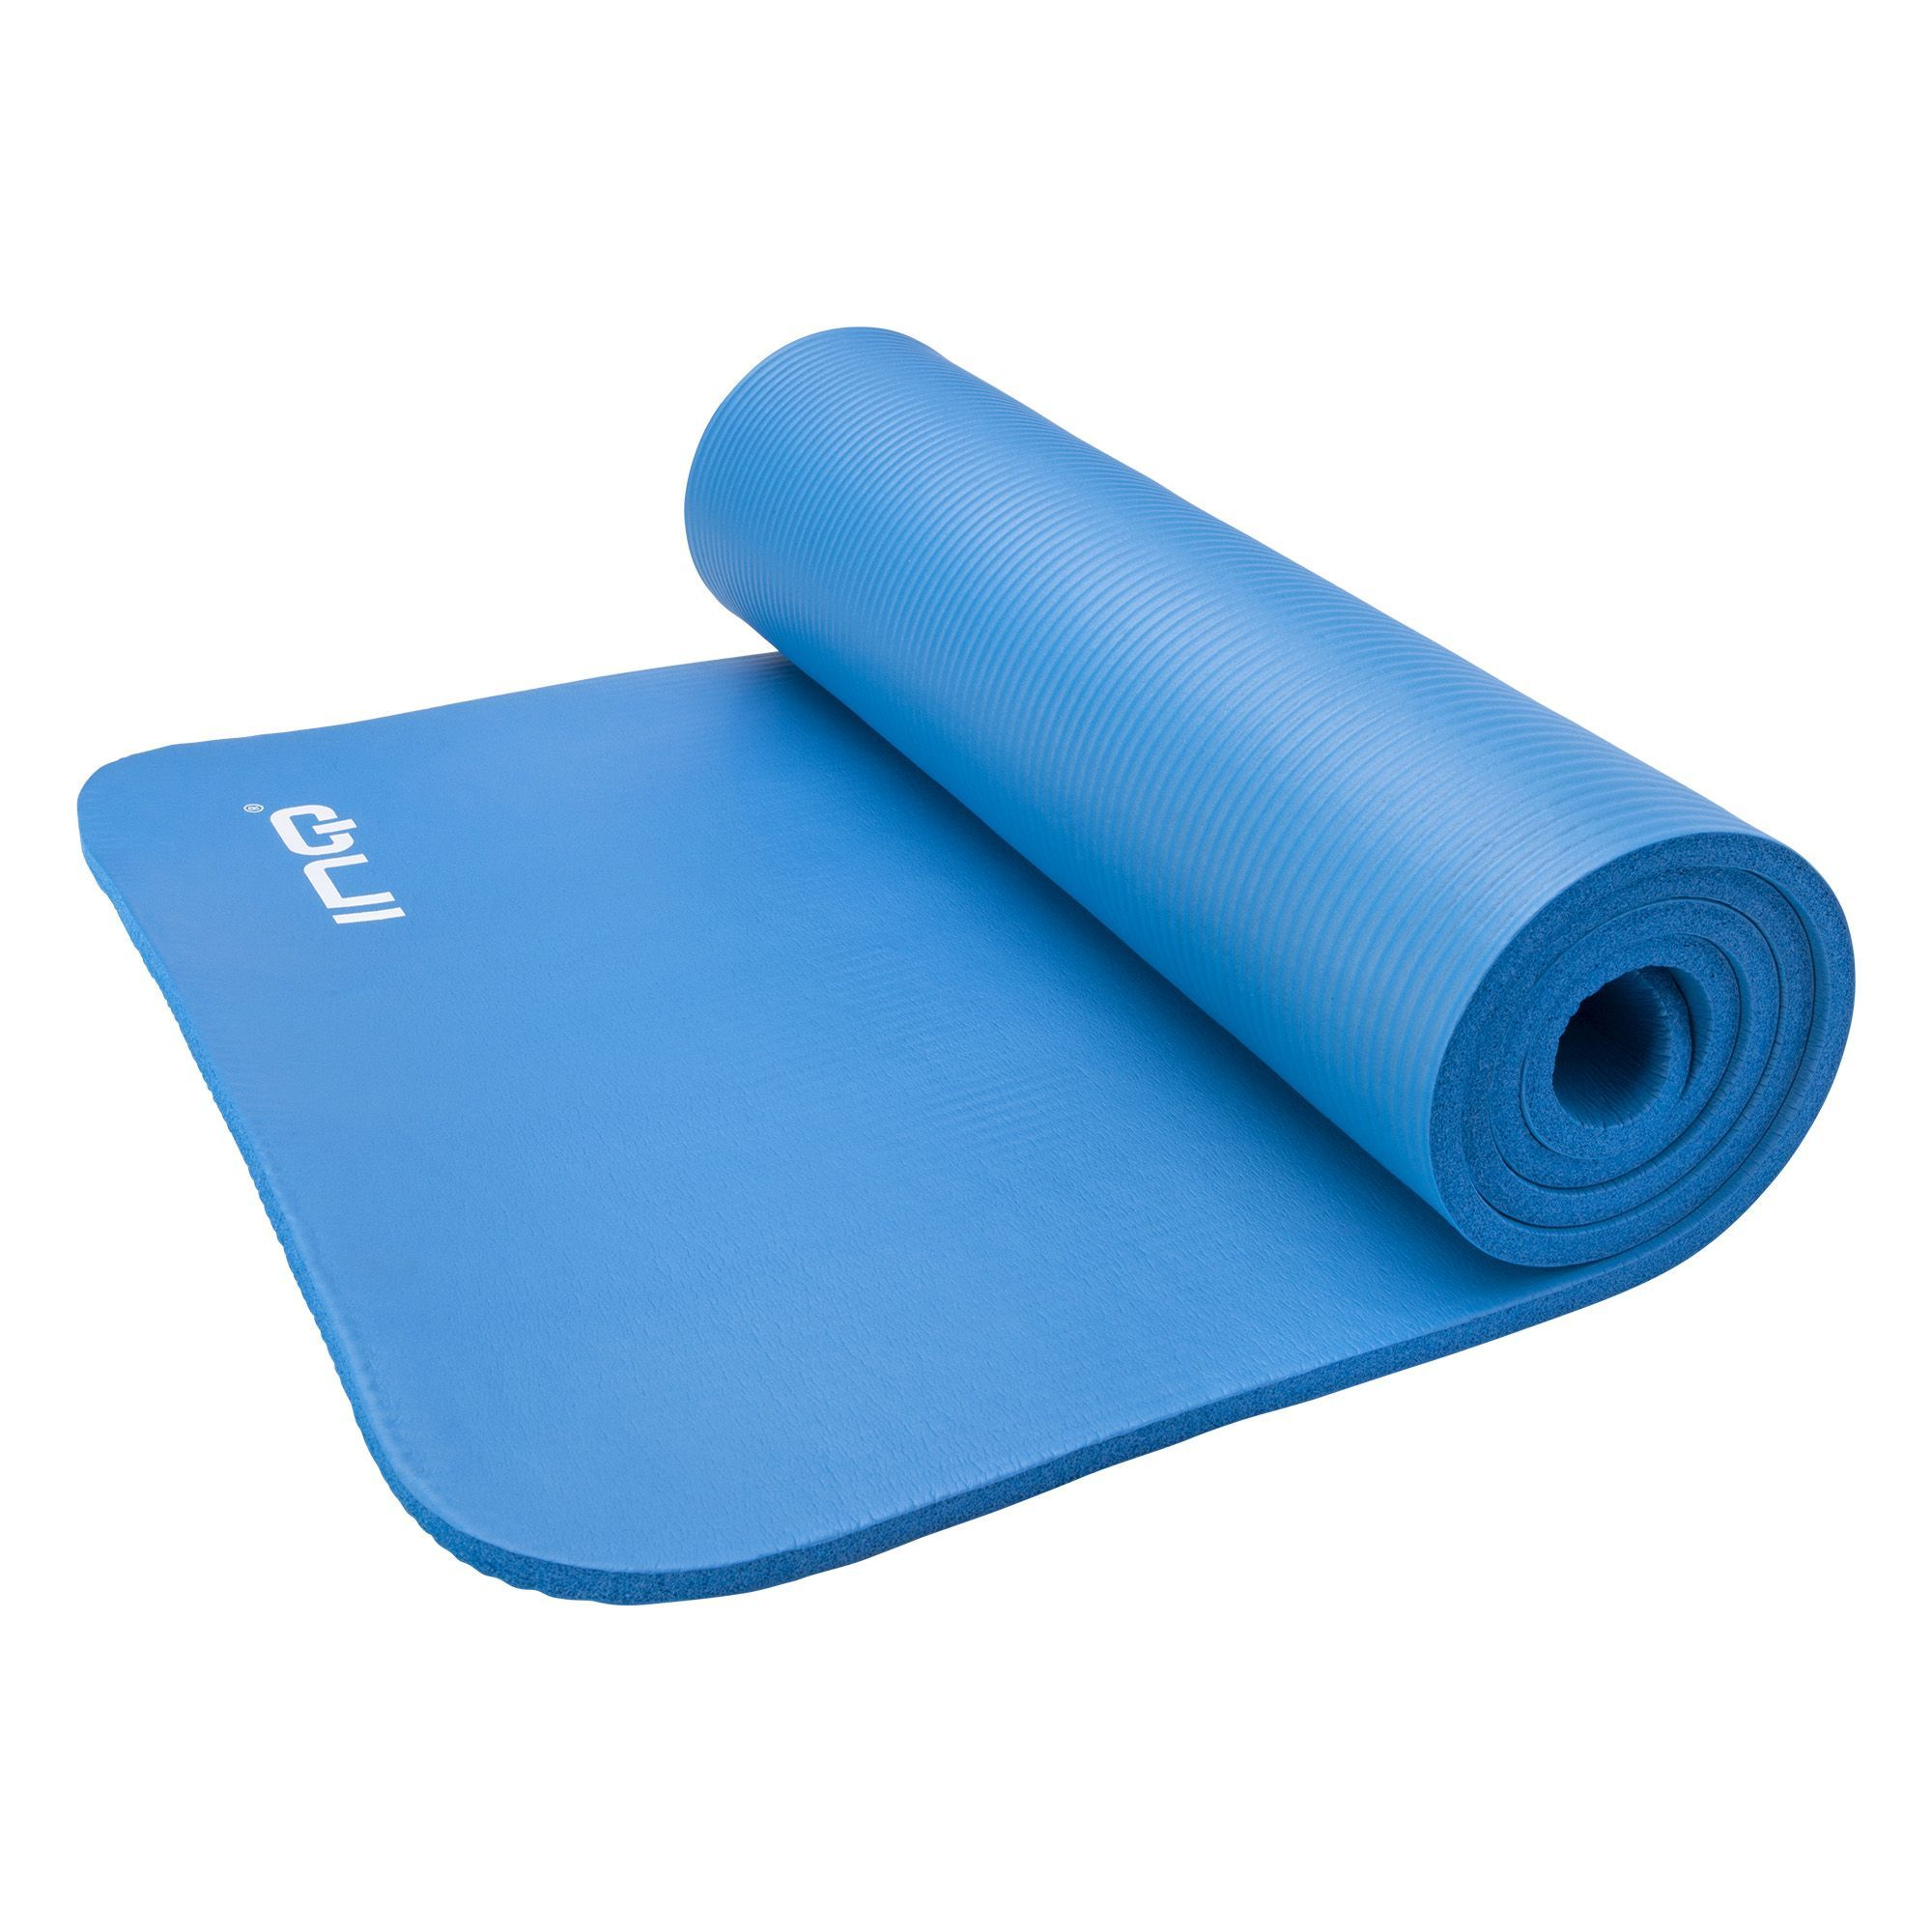 gymnastic x crash mat gymnastics gym amazing toys landing diy vented mats images toddler ideas p folding children